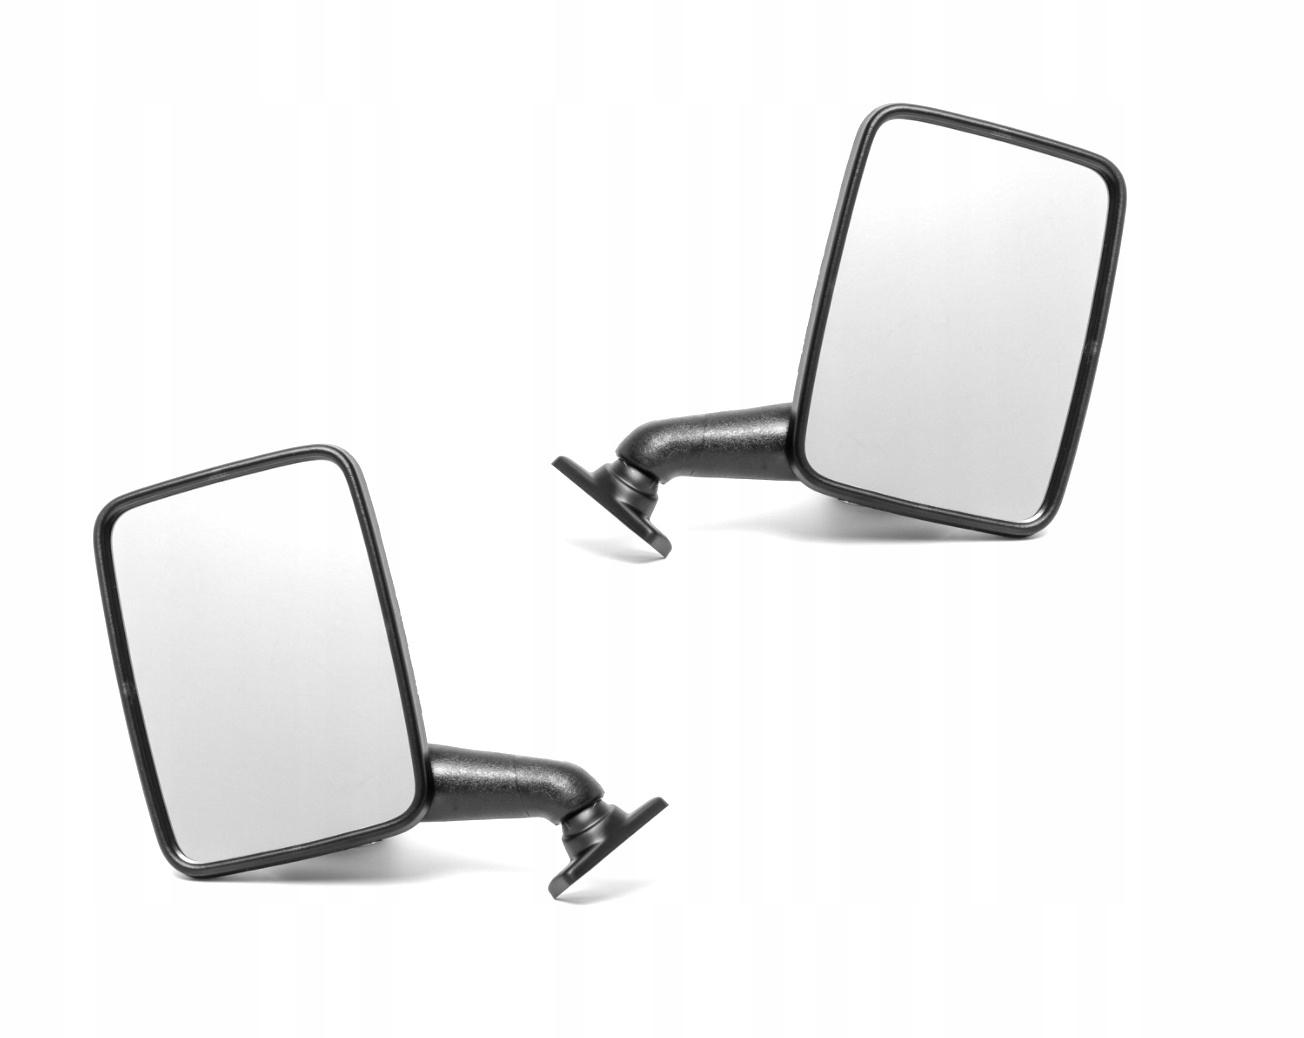 зеркало vw транспортер t3 79-92r левое новые